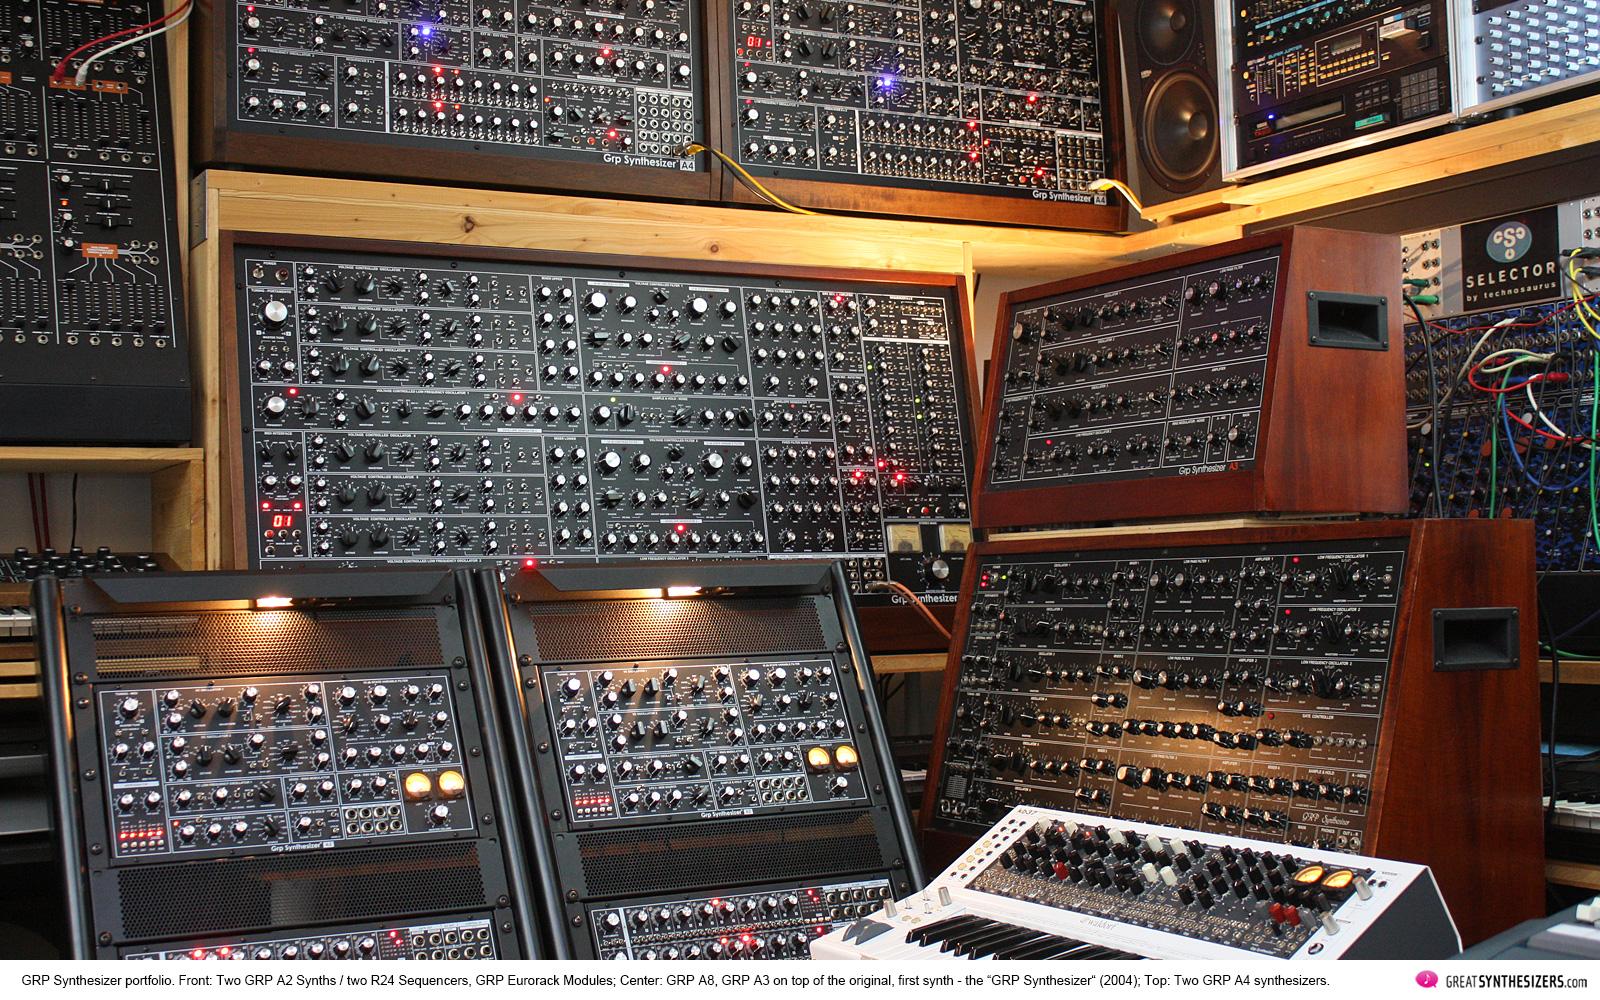 GRP Synthesizer - A2 - A3 - A4 - A8 - Eurorack